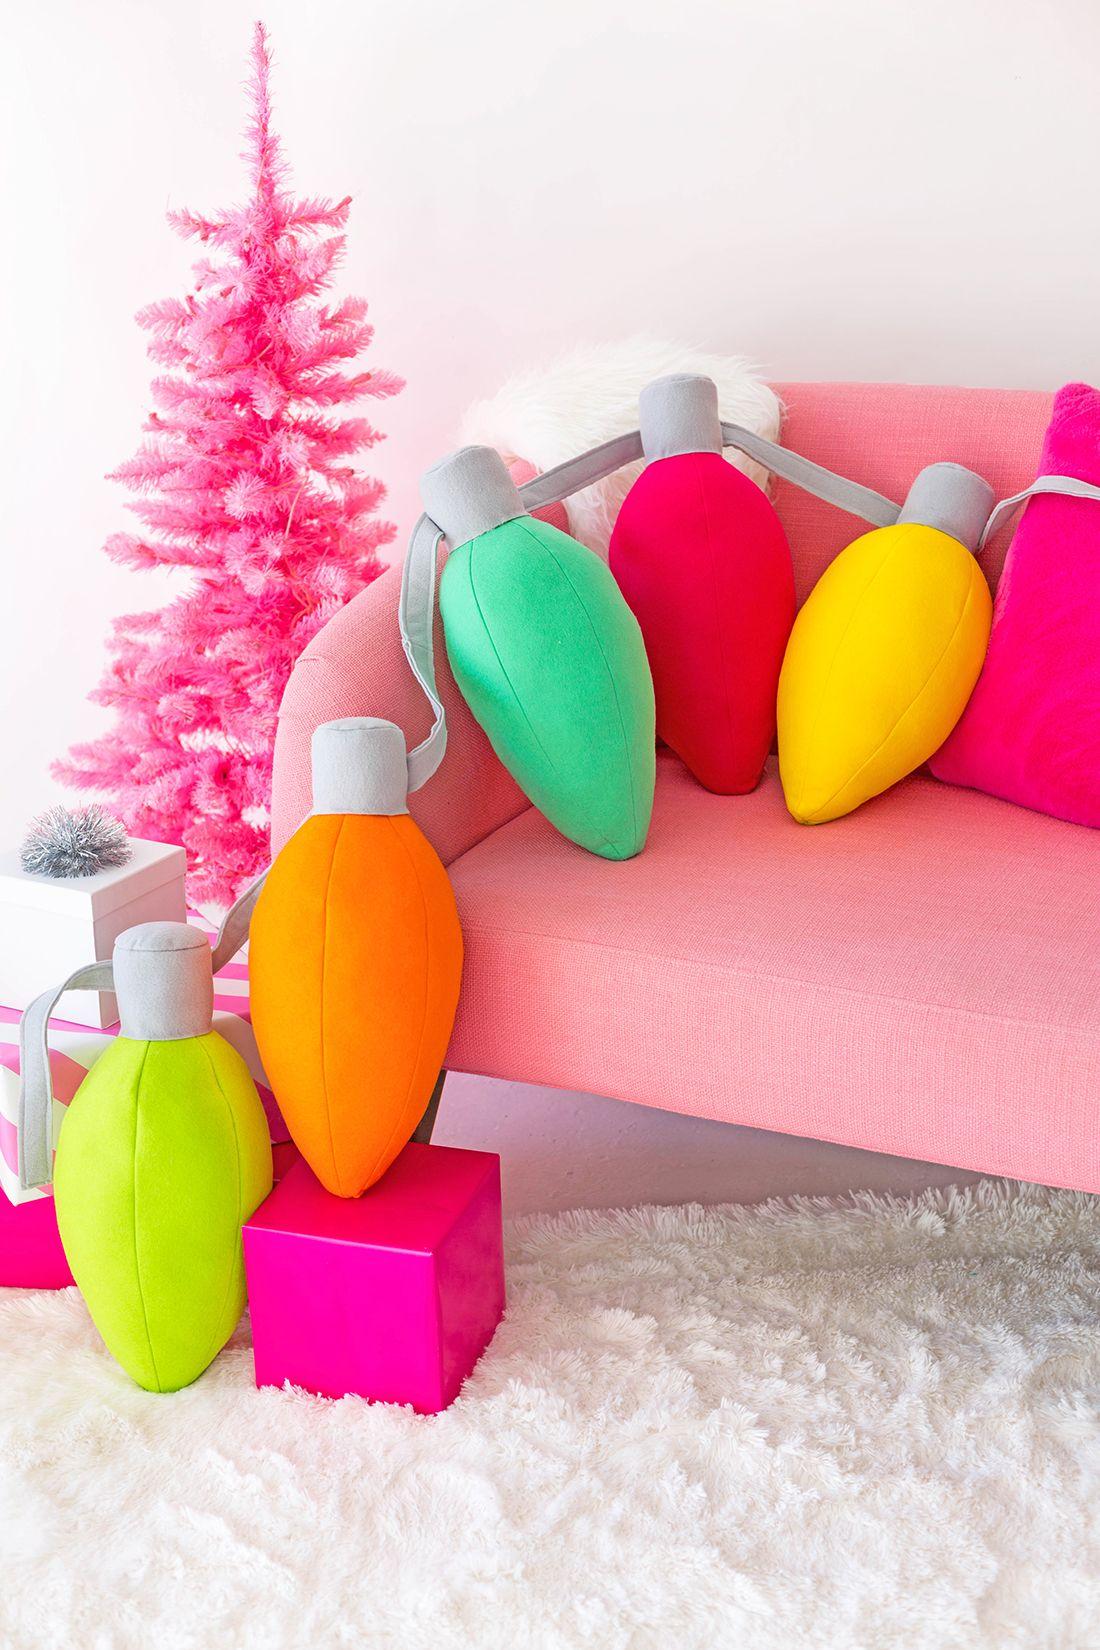 DIY Holiday Light Pillows | Christmas Crafts | Pinterest | Pillows ...